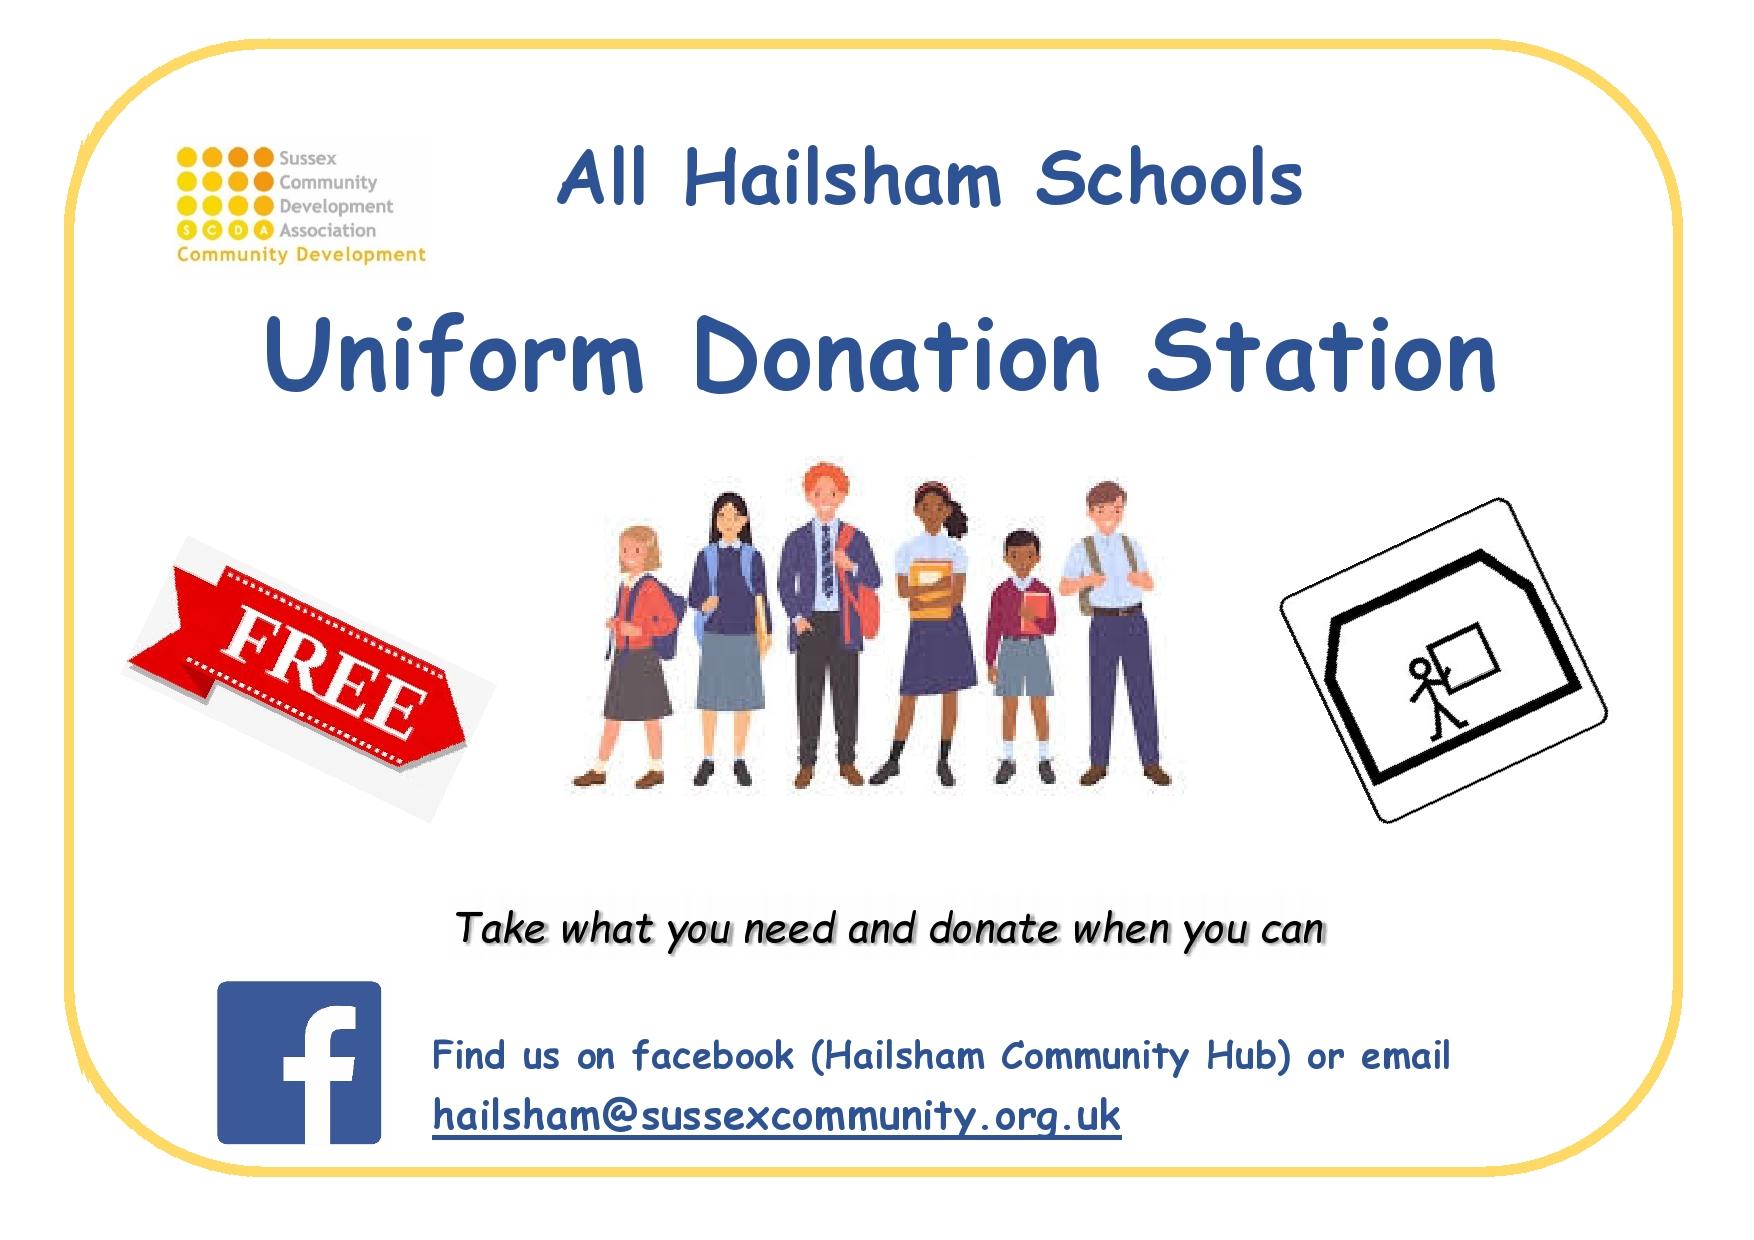 School Uniform Donation Station